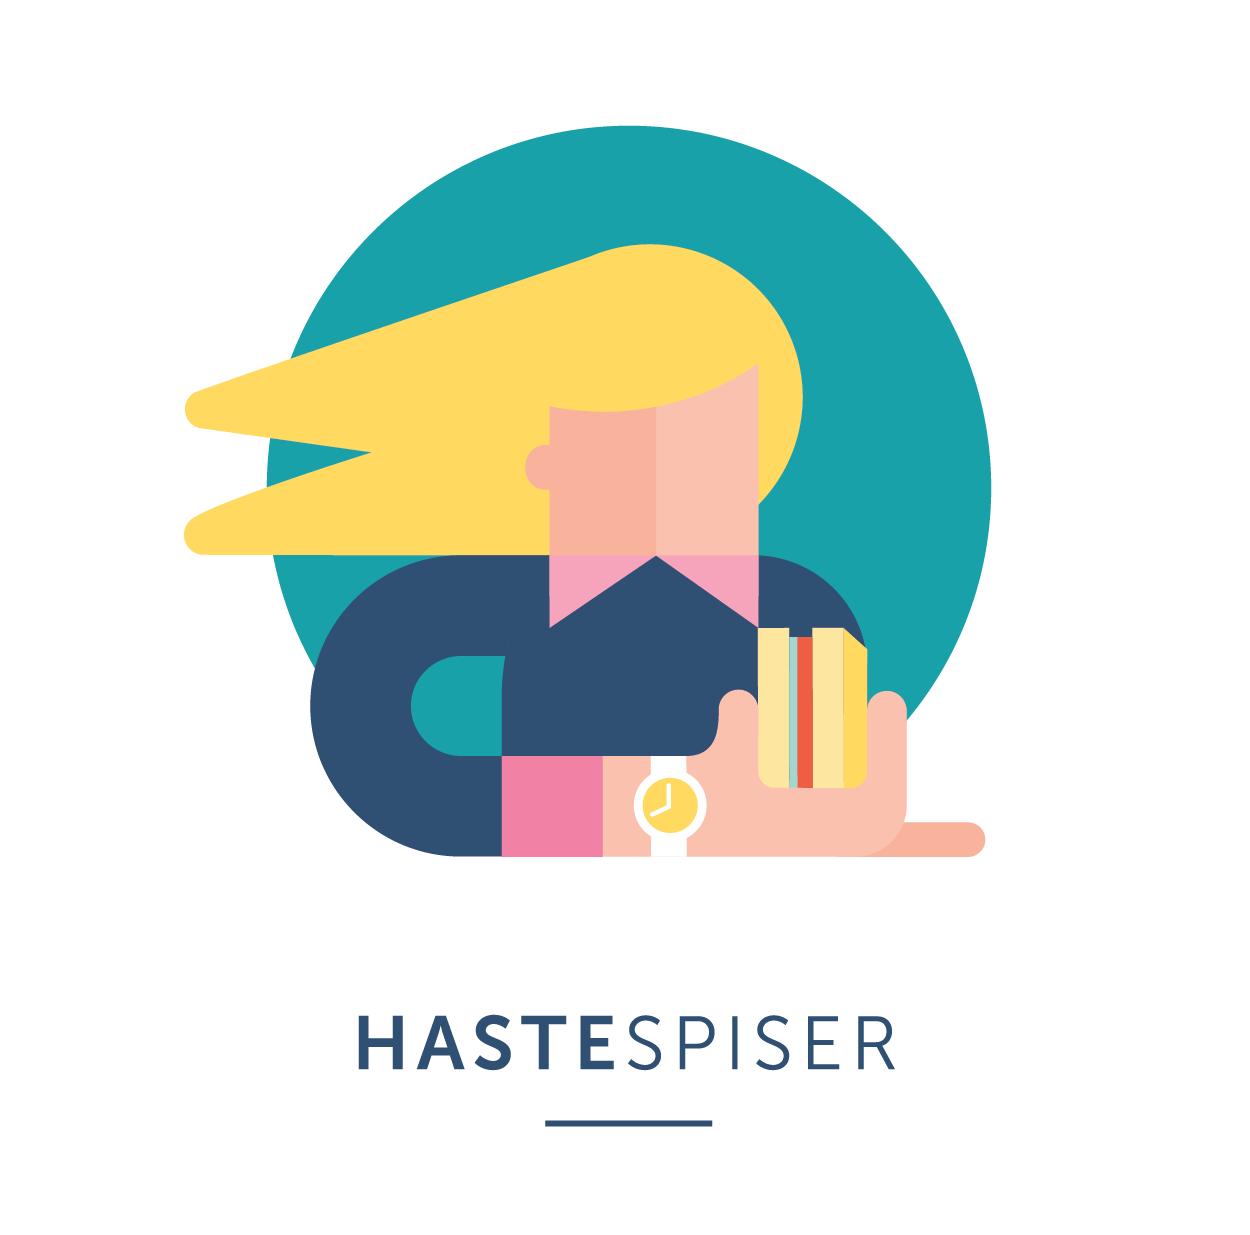 Hastespiser.png